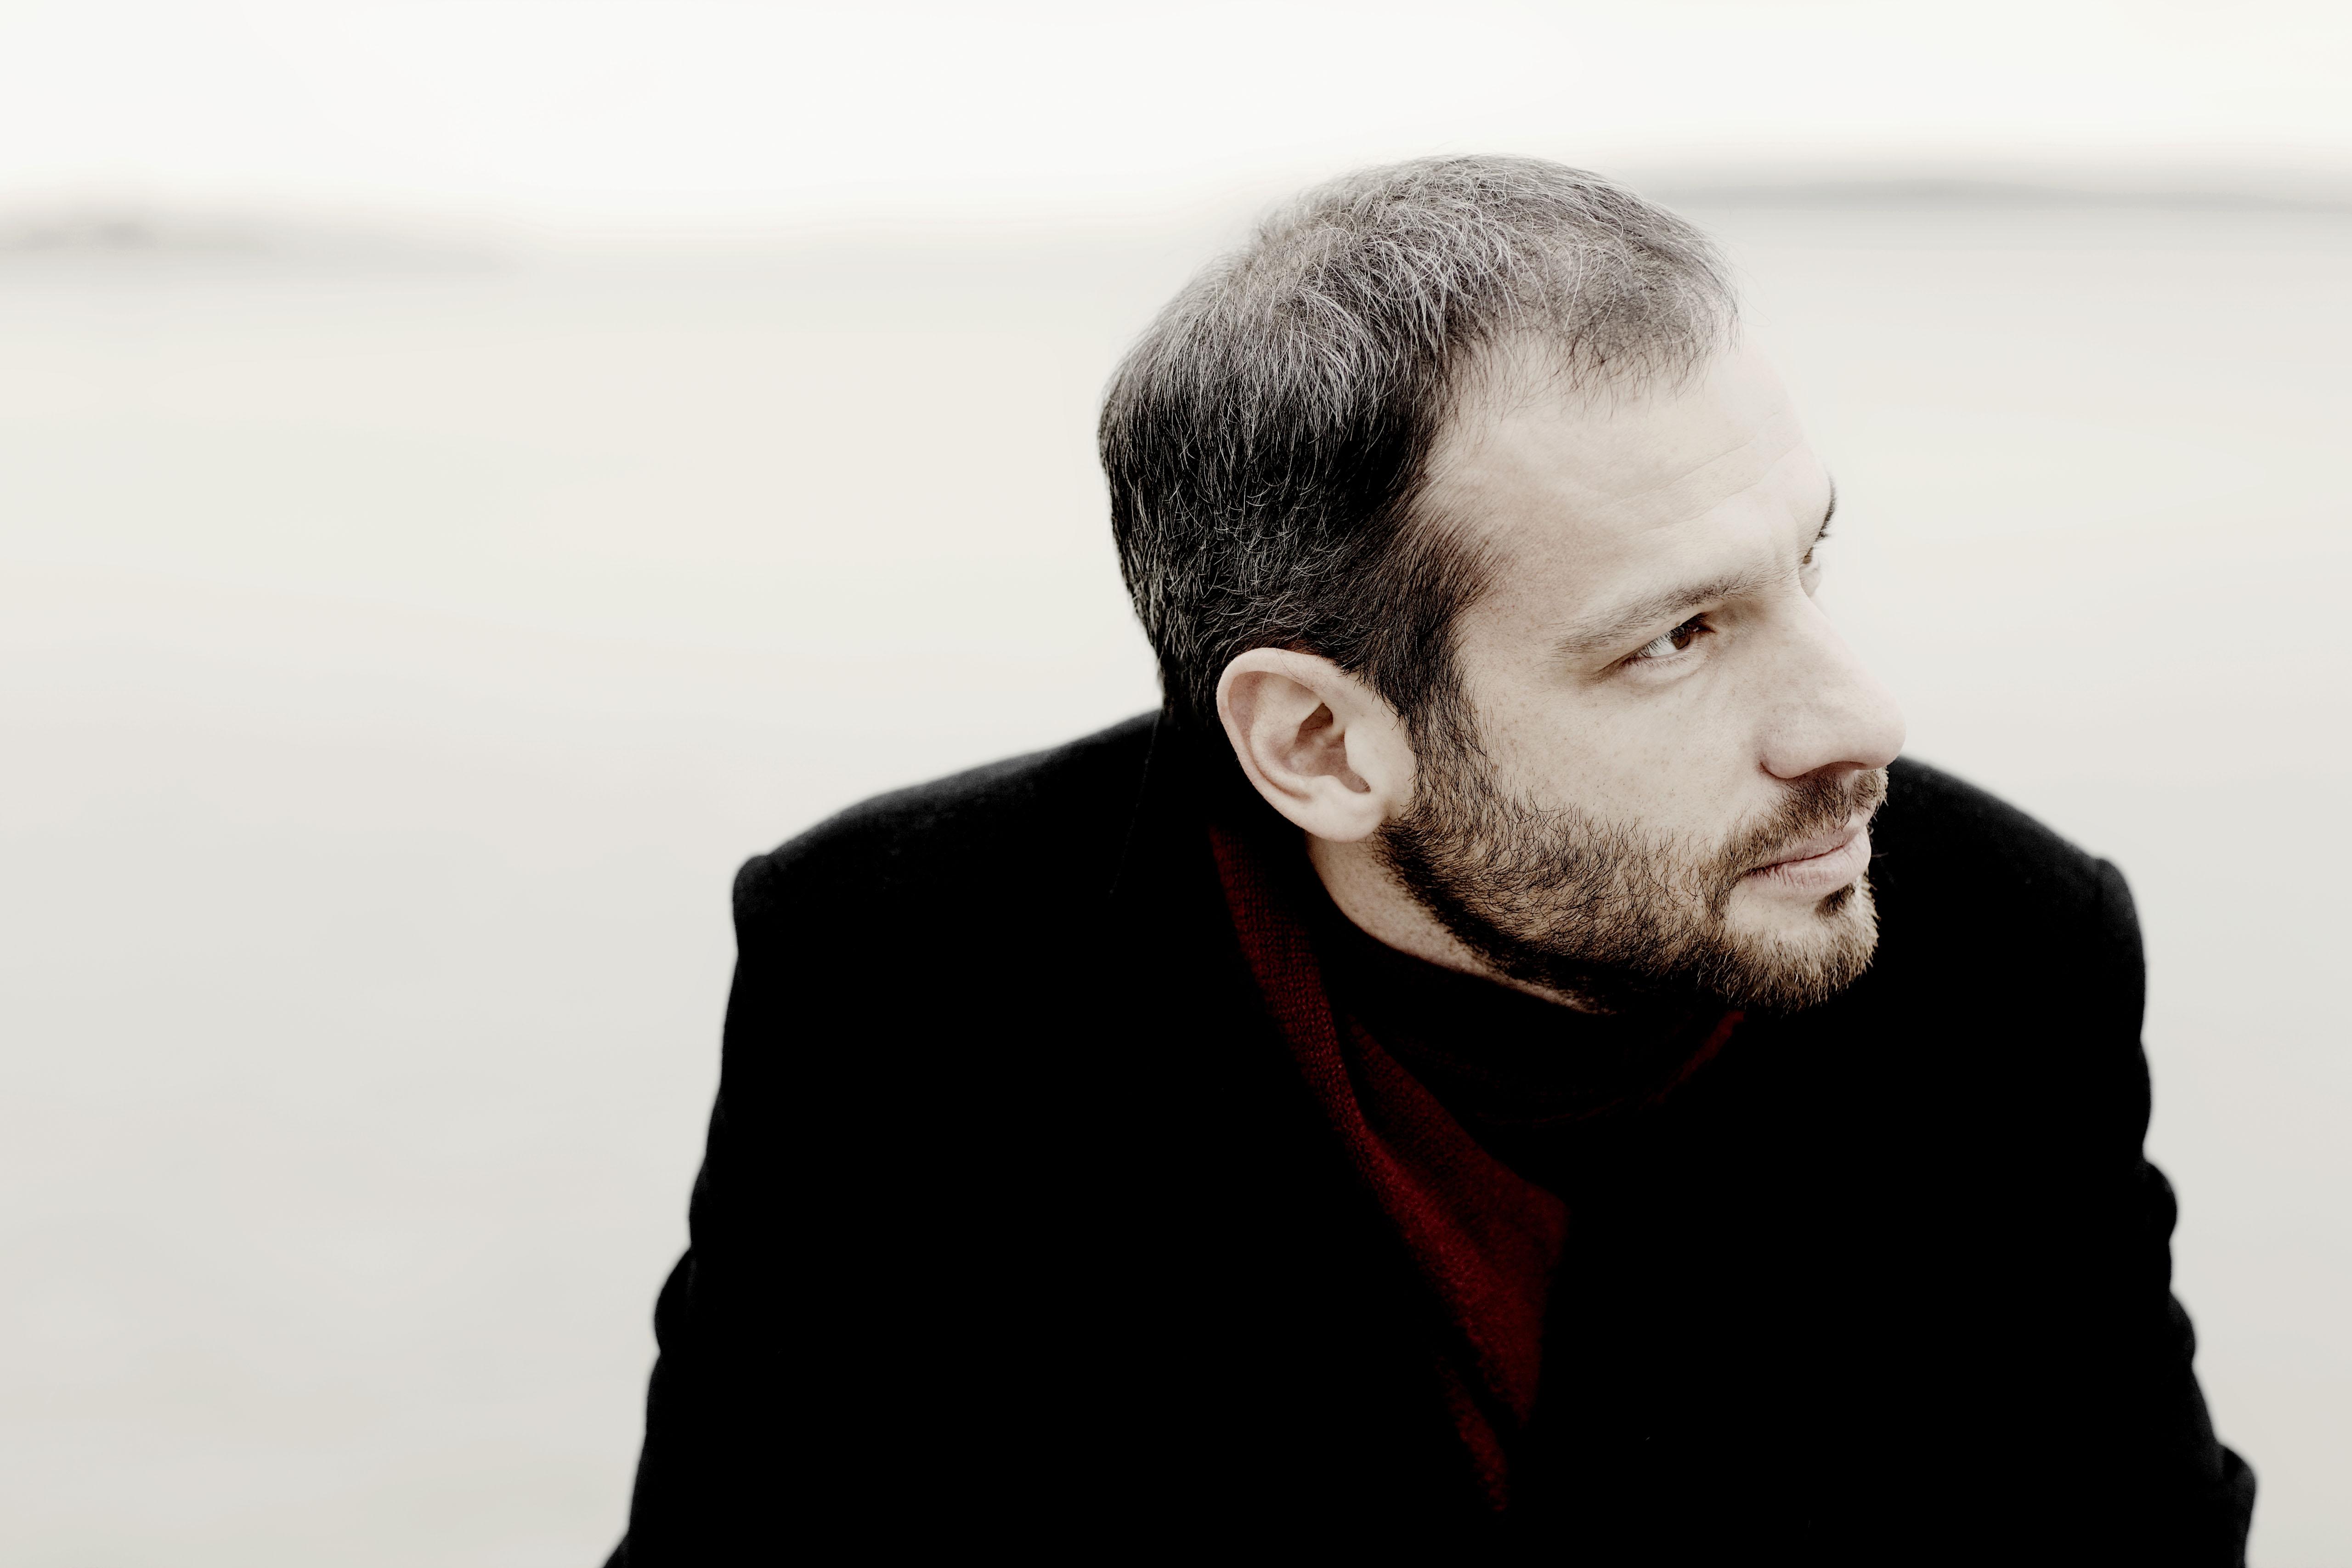 Dima Slobodeniouk. Photo by Marco Borggreve.